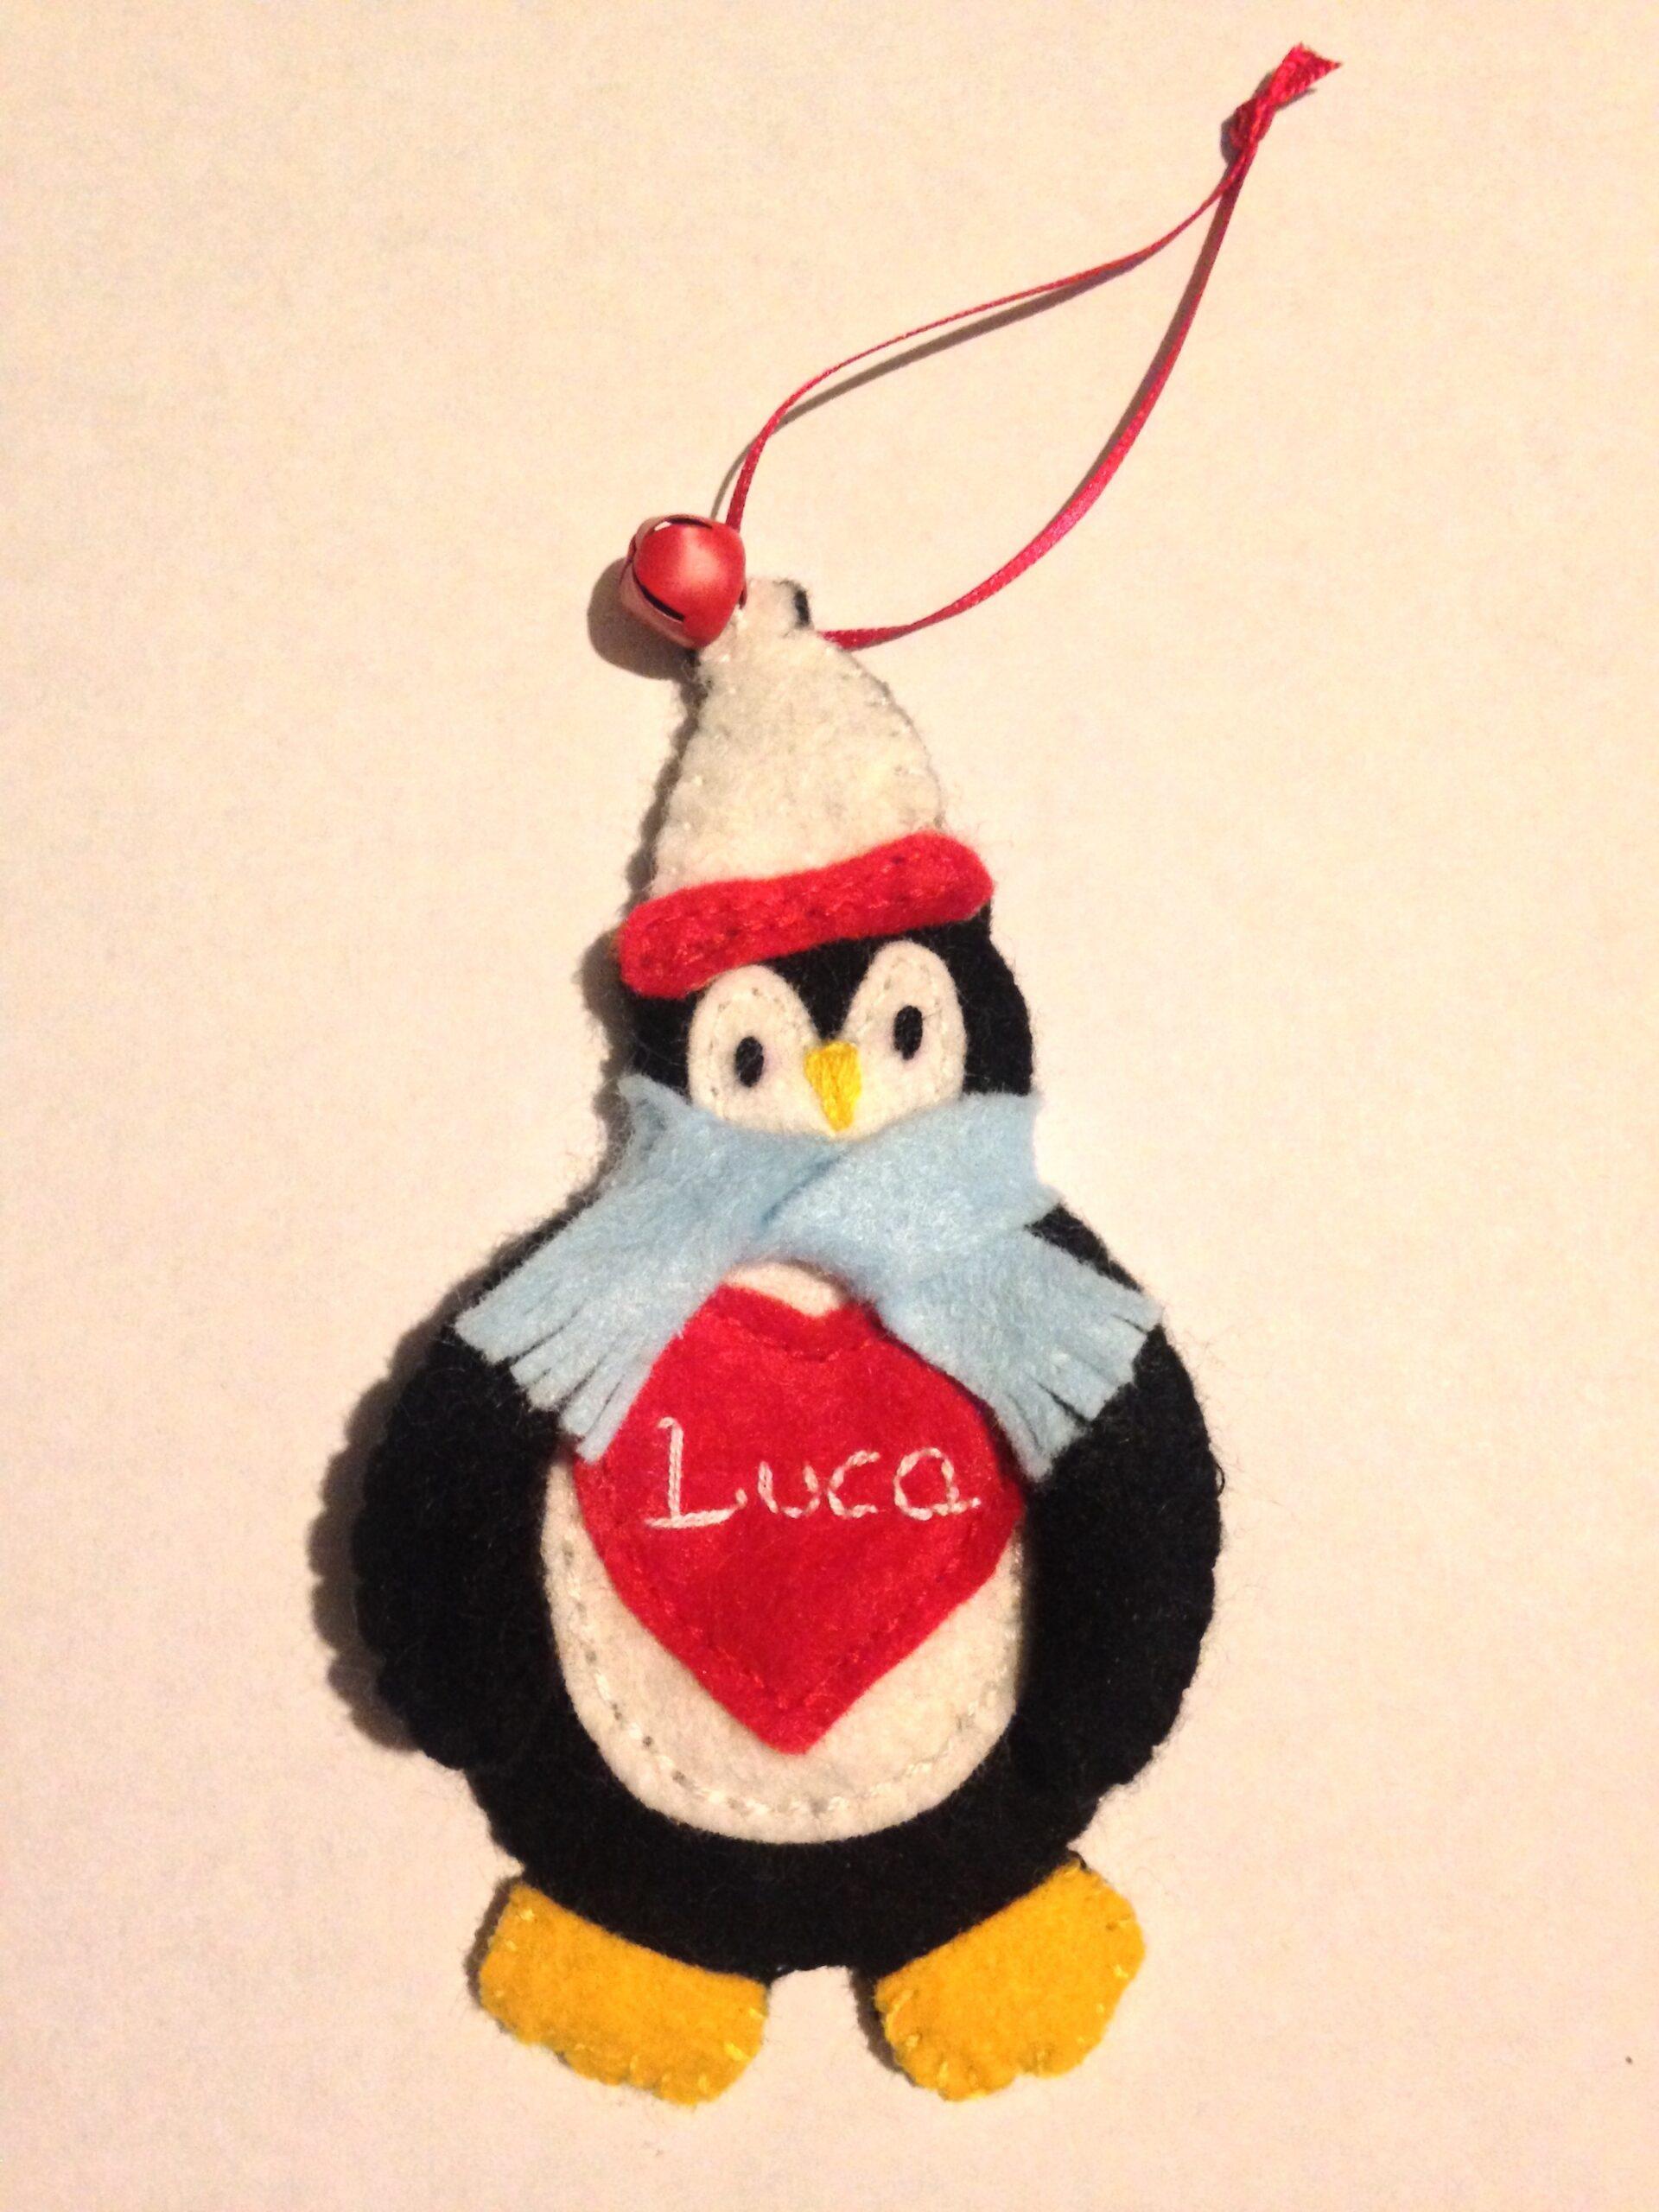 Little winter Penguin hanging decoration.